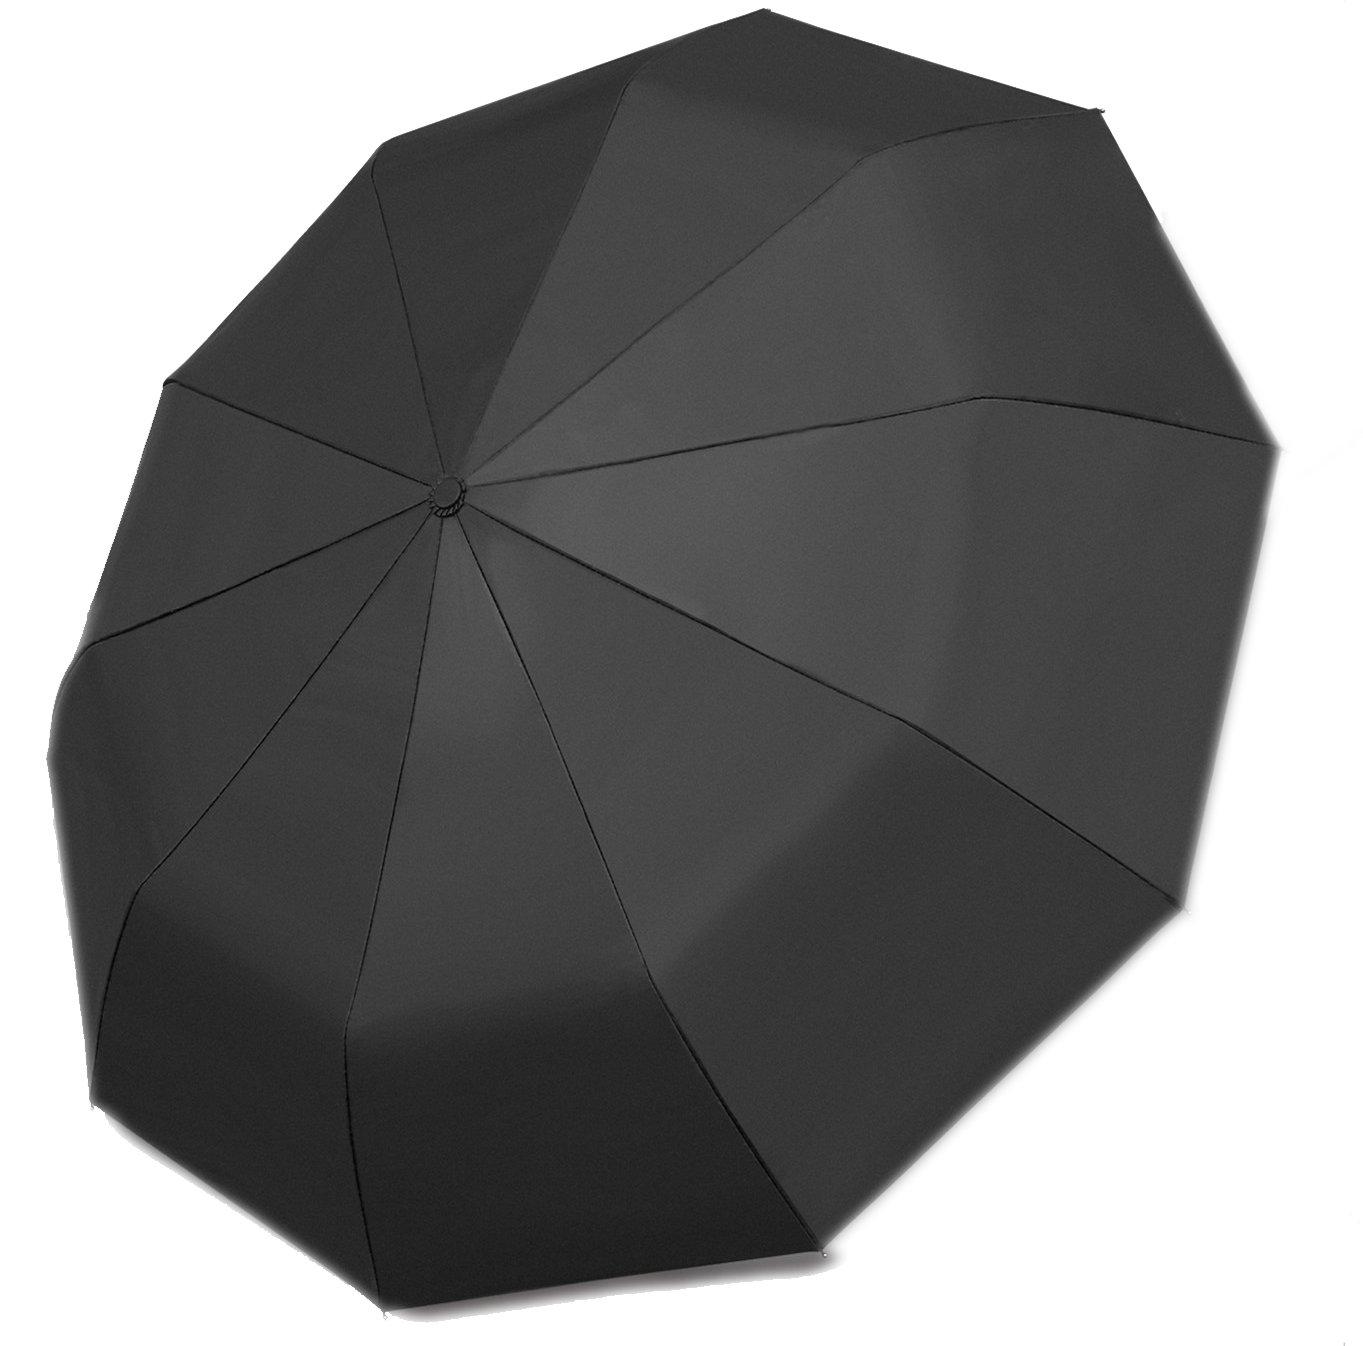 7428790c468e Stormeagle Reinforced 10 Ribs Travel Automatic Umbrellas Auto Open Close  Folding Golf Lightweight Compact Windproof Umbrella, Sturdy Durable  Portable ...